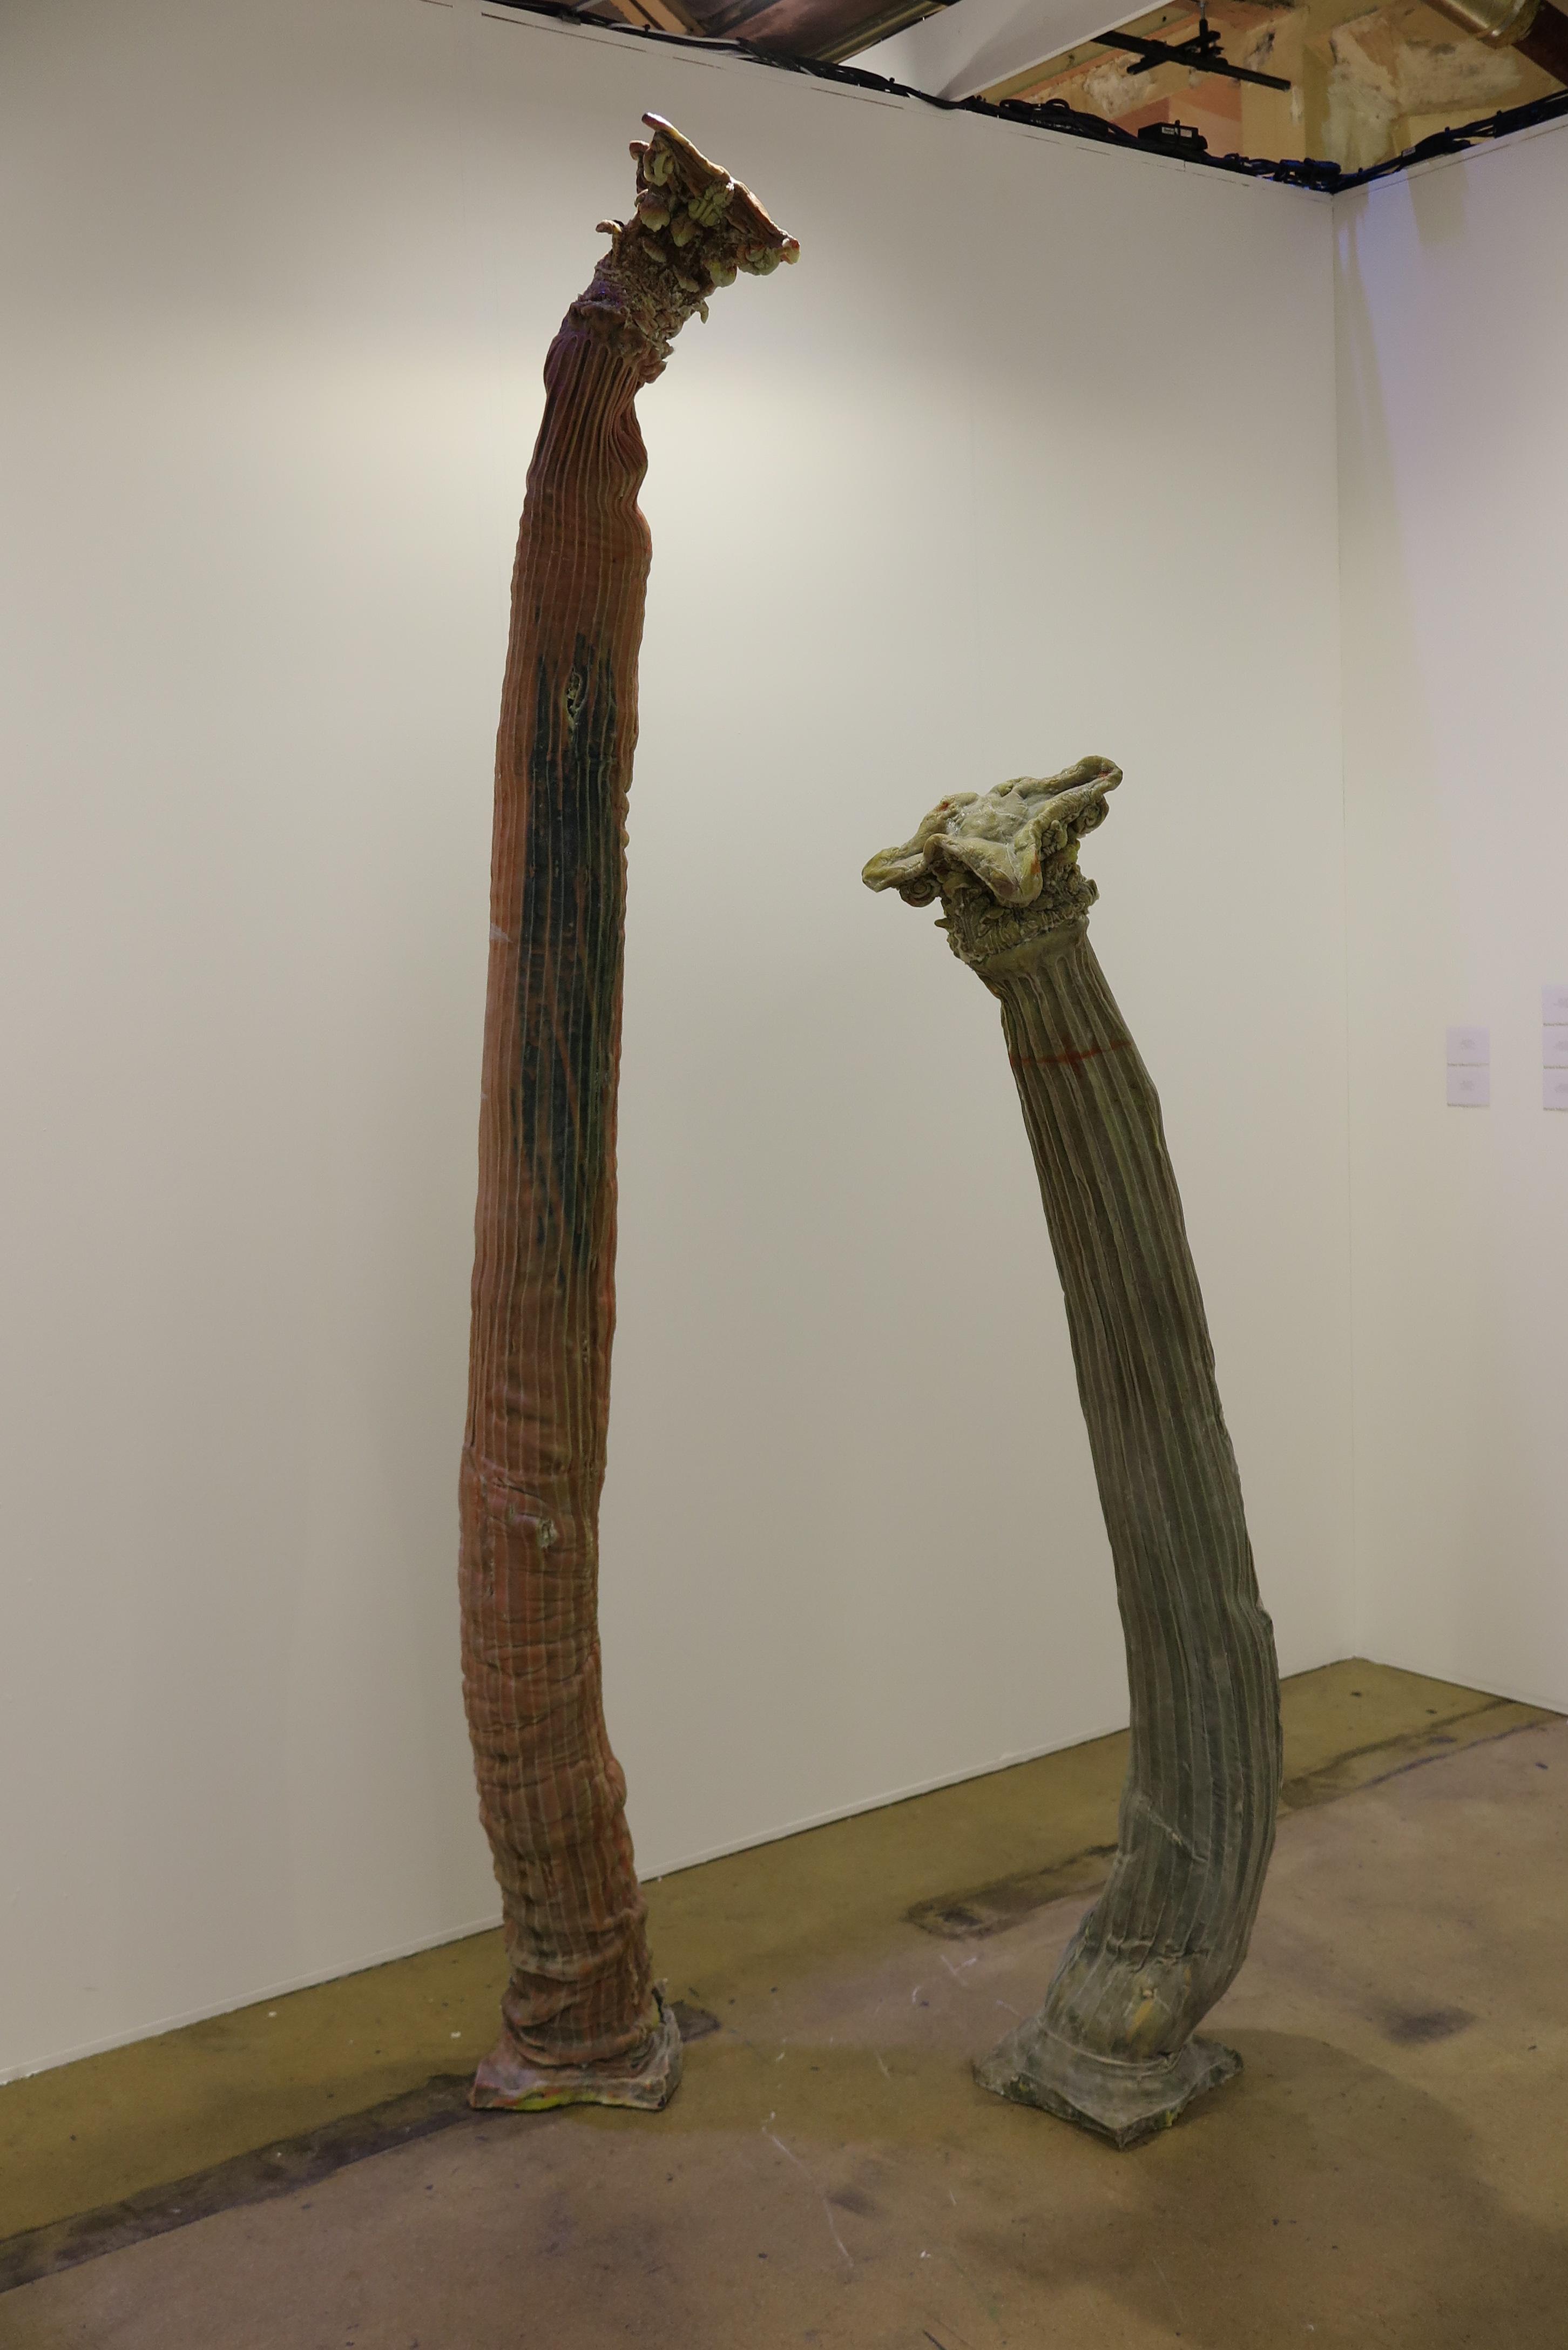 Galerie: Gerhard Hofland. Kunstenaar: Bas de Wit (Main)